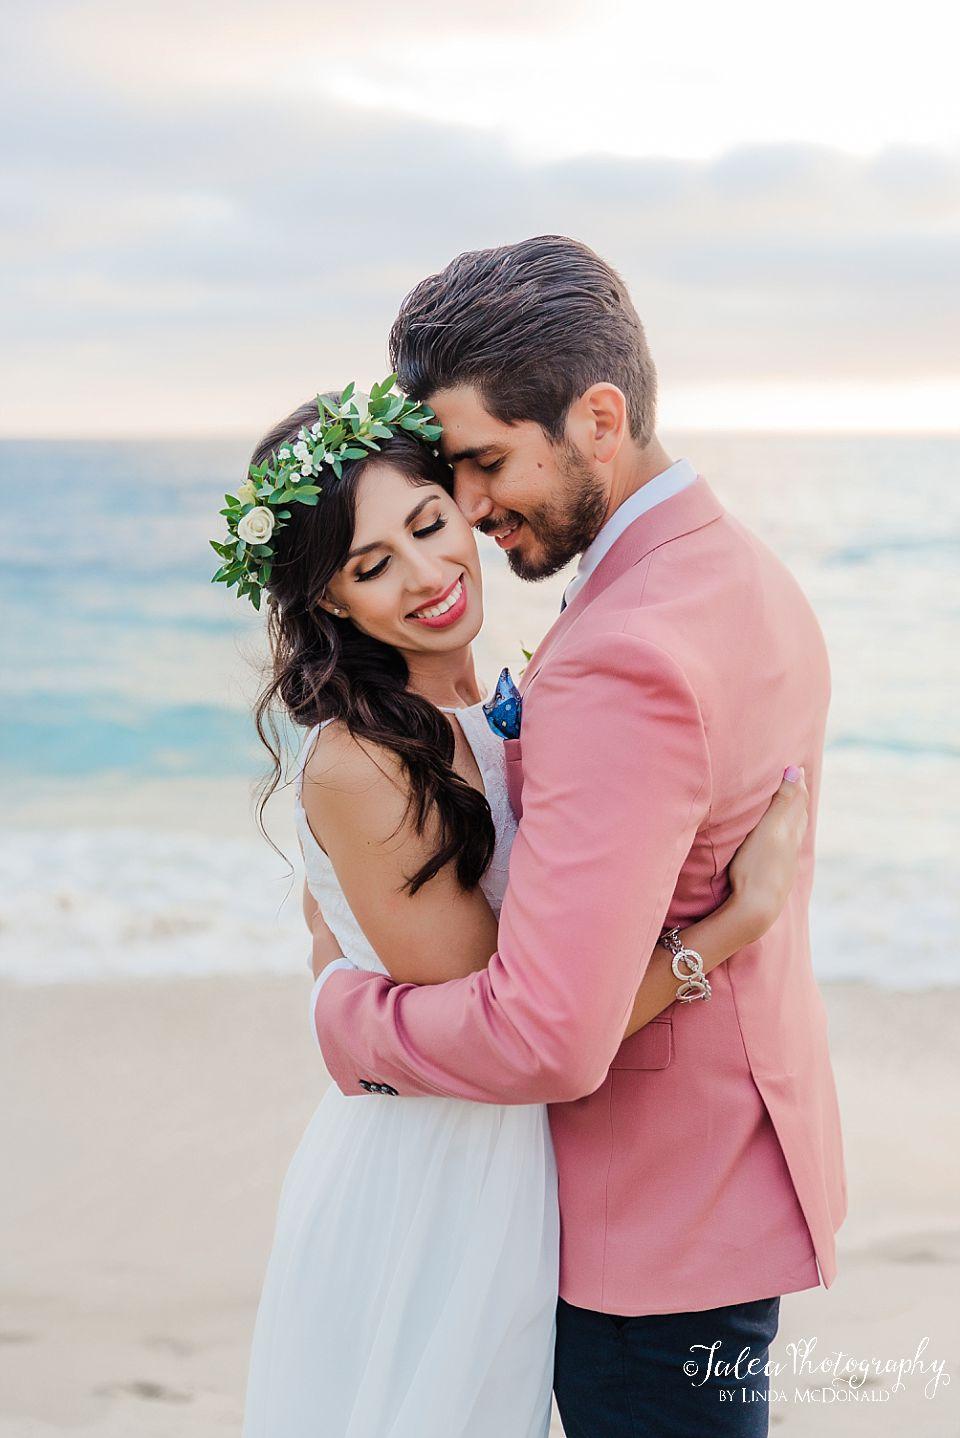 groom nuzzling bride california elopement destinations